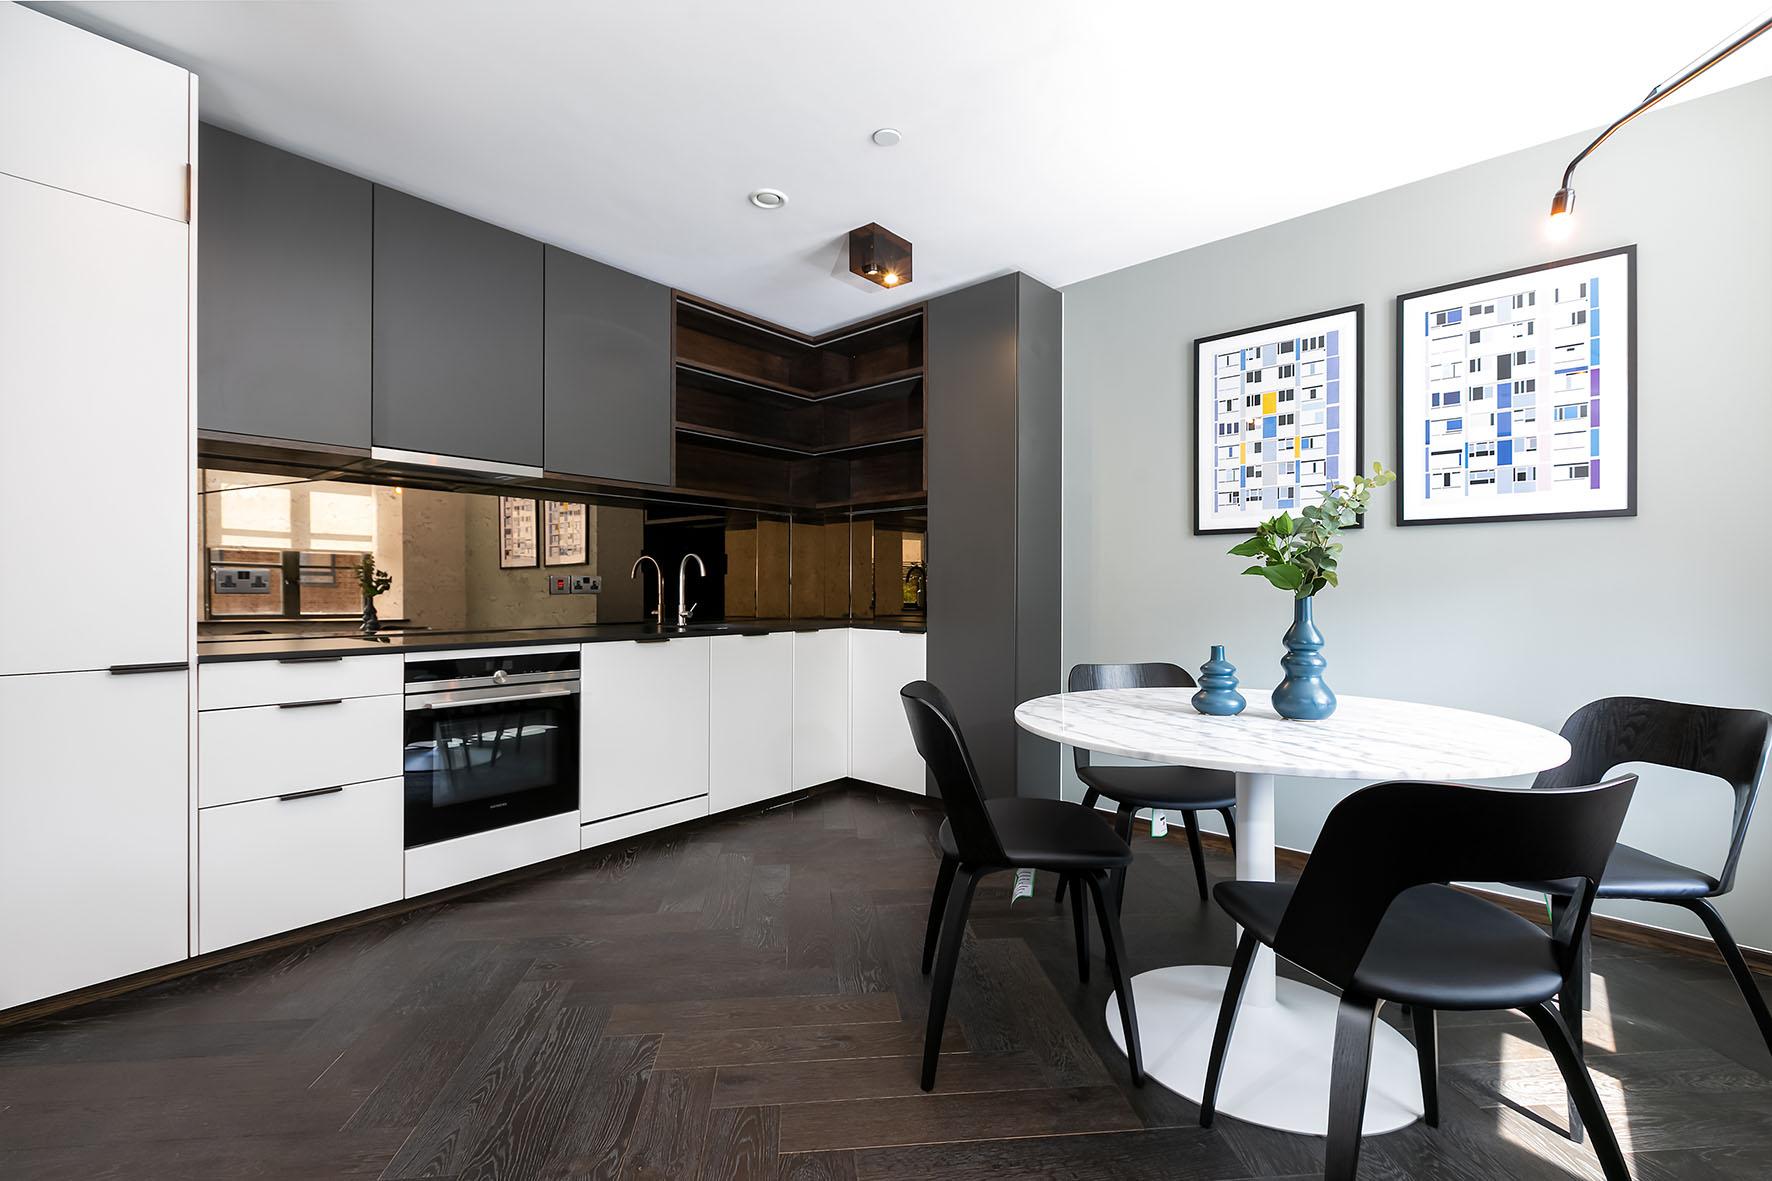 Lovelydays luxury service apartment rental - London - Soho - Oxford Street V - Lovelysuite - 1 bedrooms - 1 bathrooms - Luxury kitchen - 5a4304b1408f - Lovelydays